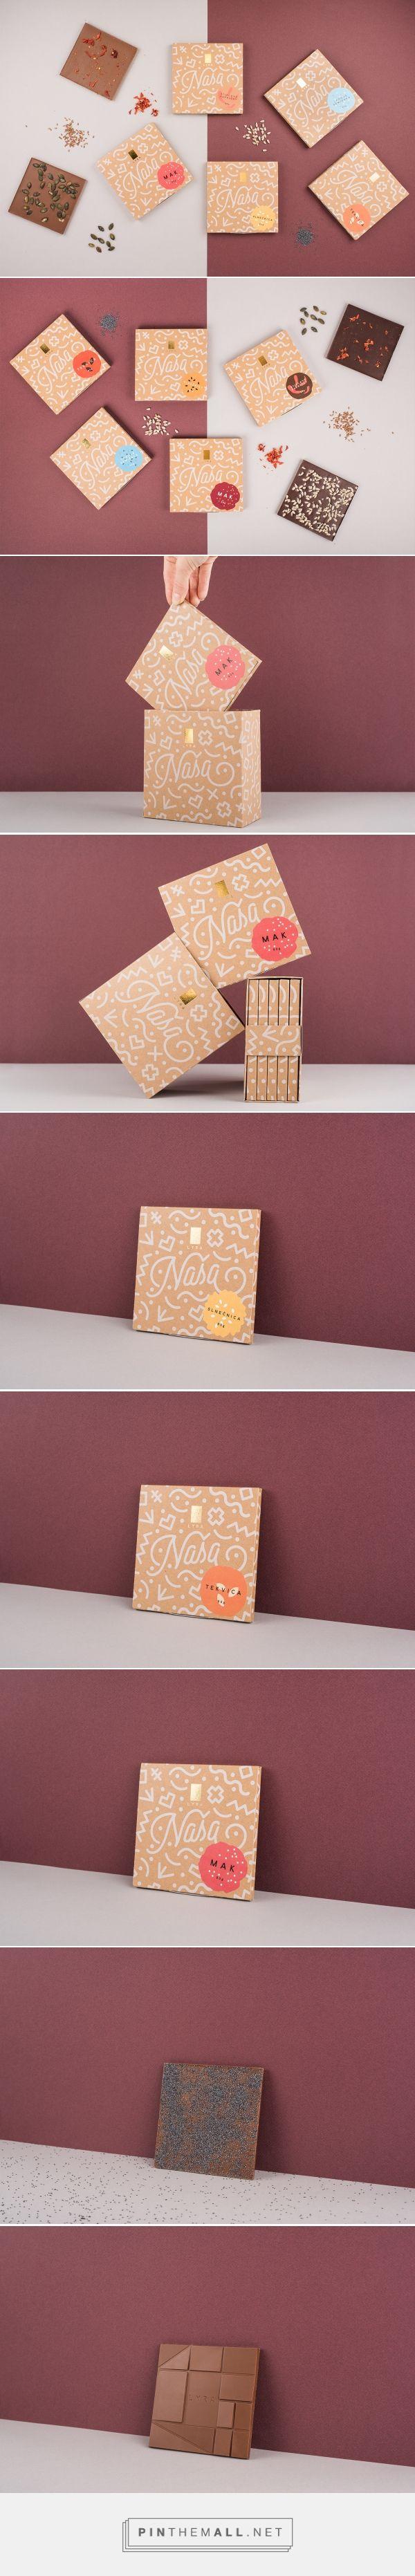 NAŠA LYRA Chocolate - Packaging of the World - Creative Package Design Gallery - http://www.packagingoftheworld.com/2018/01/nasa-lyra-chocolate.html